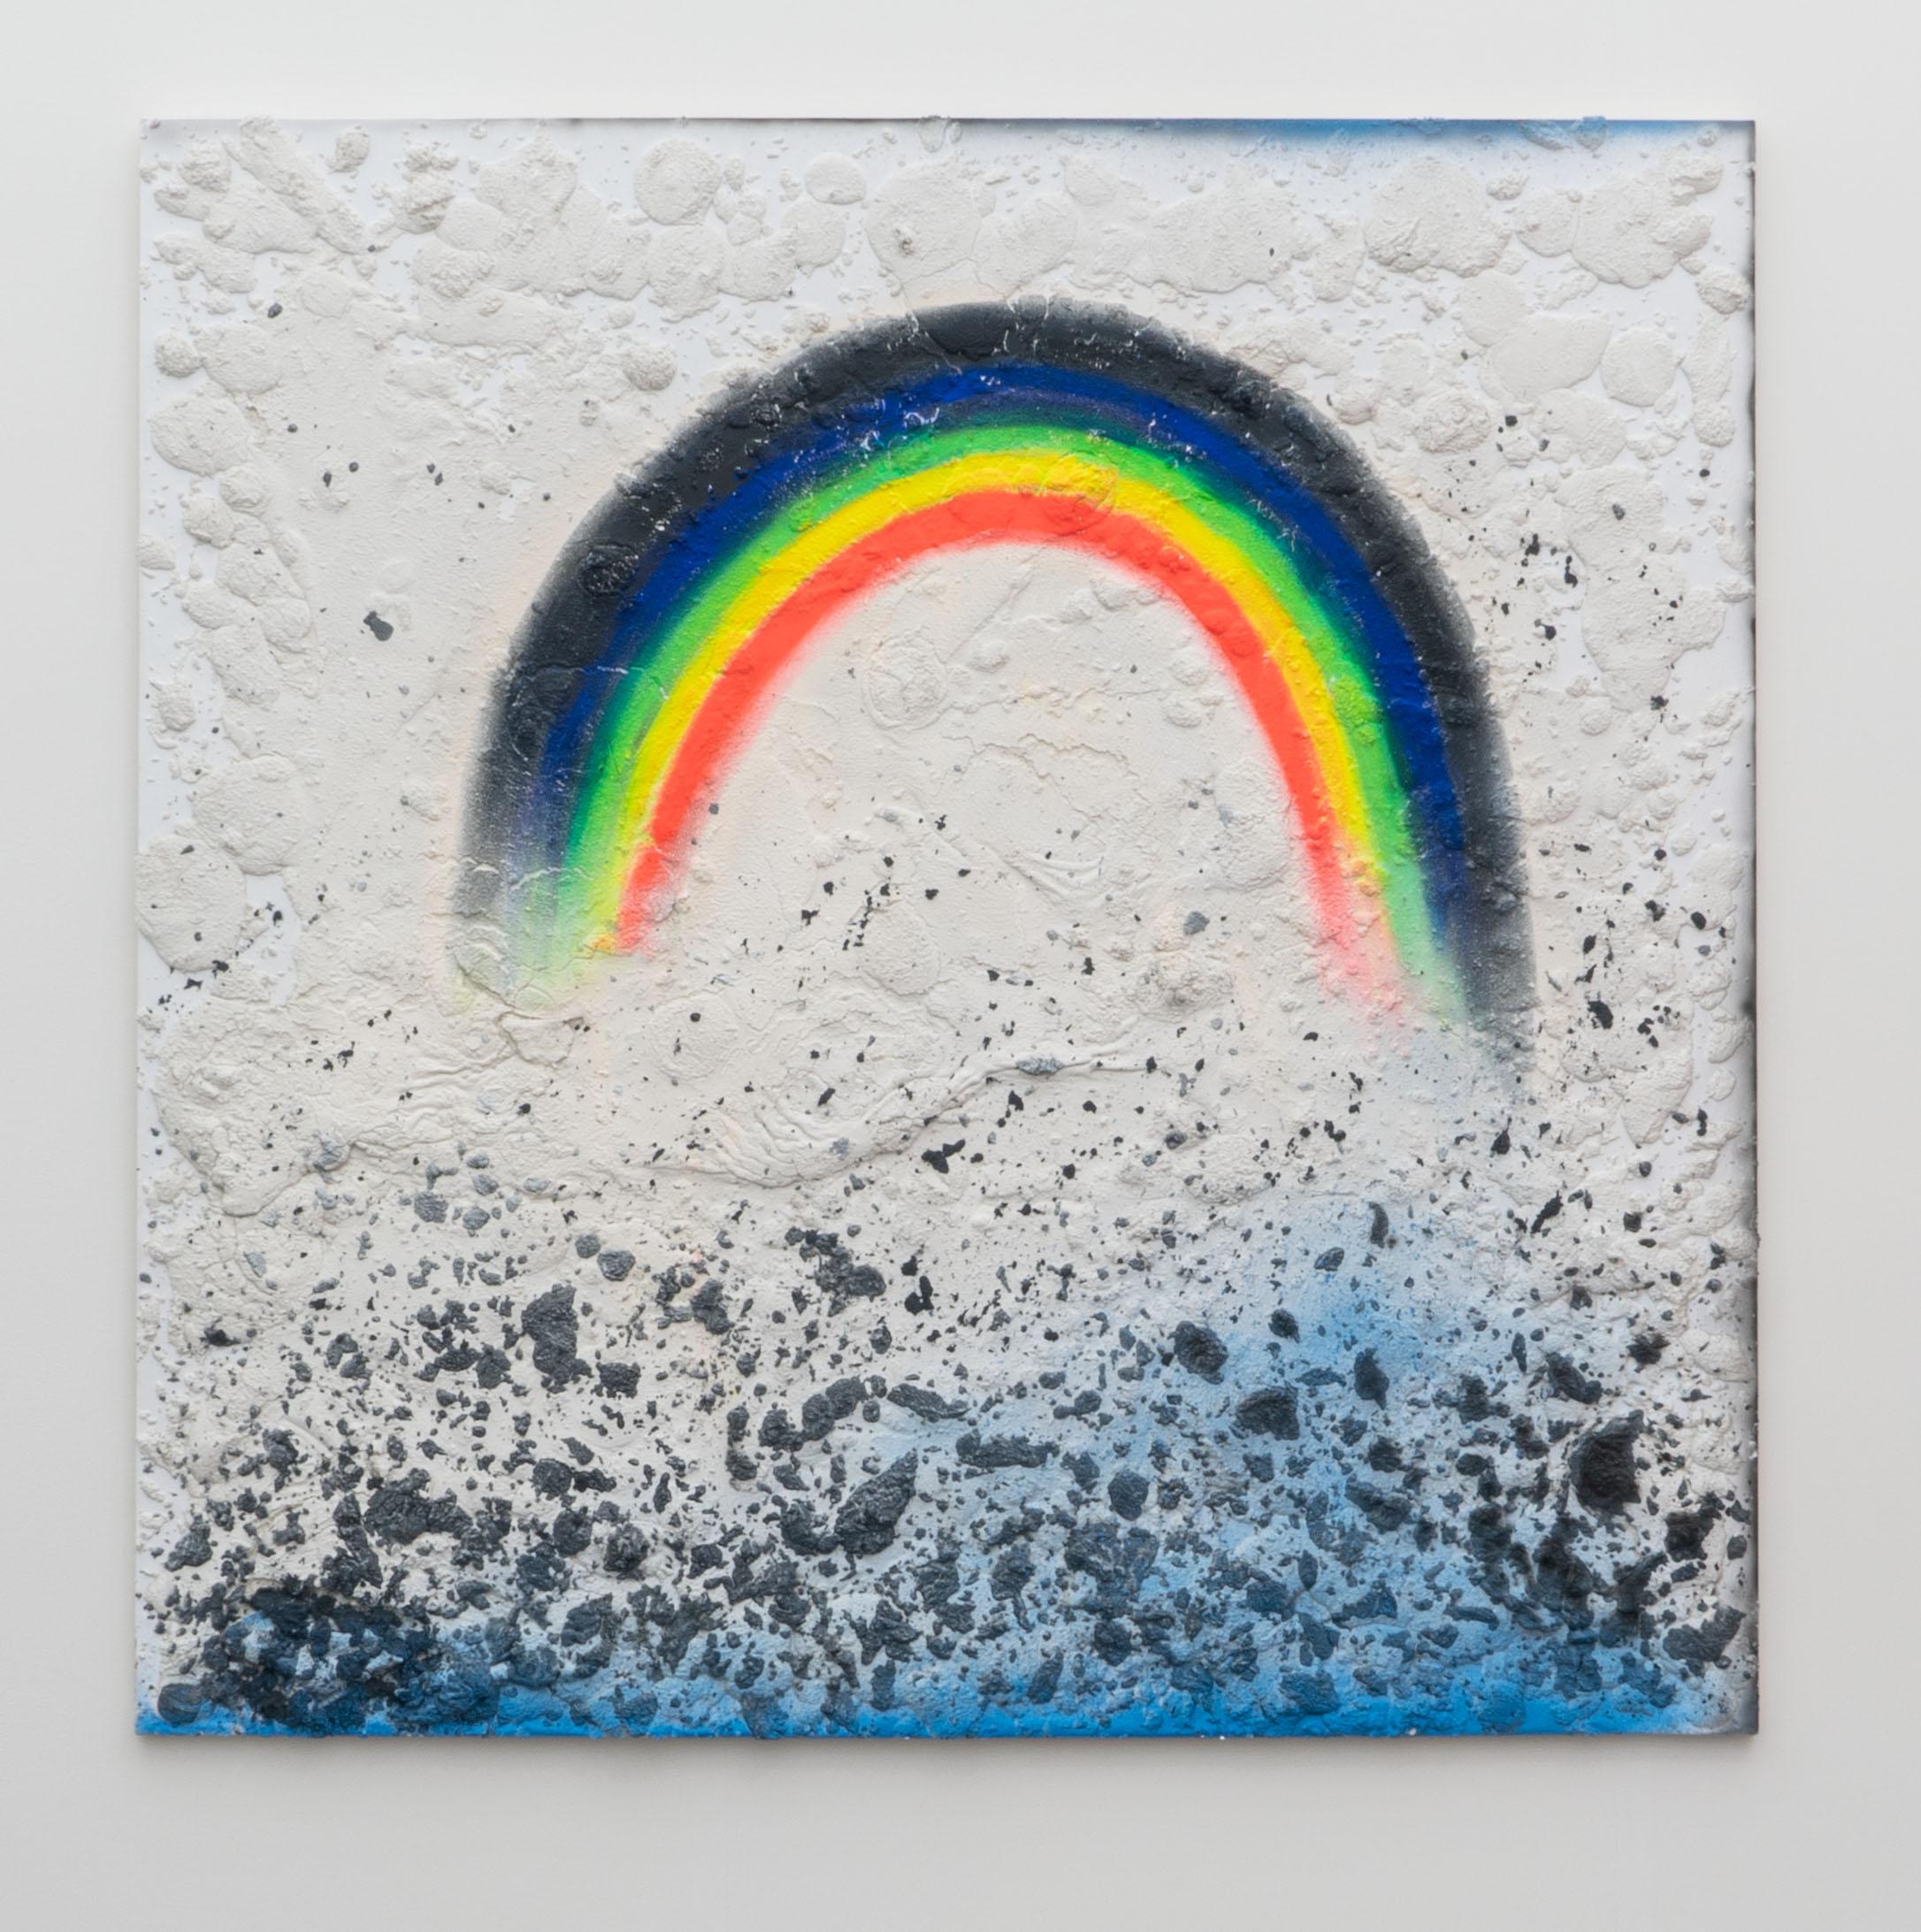 Big Black Rainbow (Heavier Days Ahead)